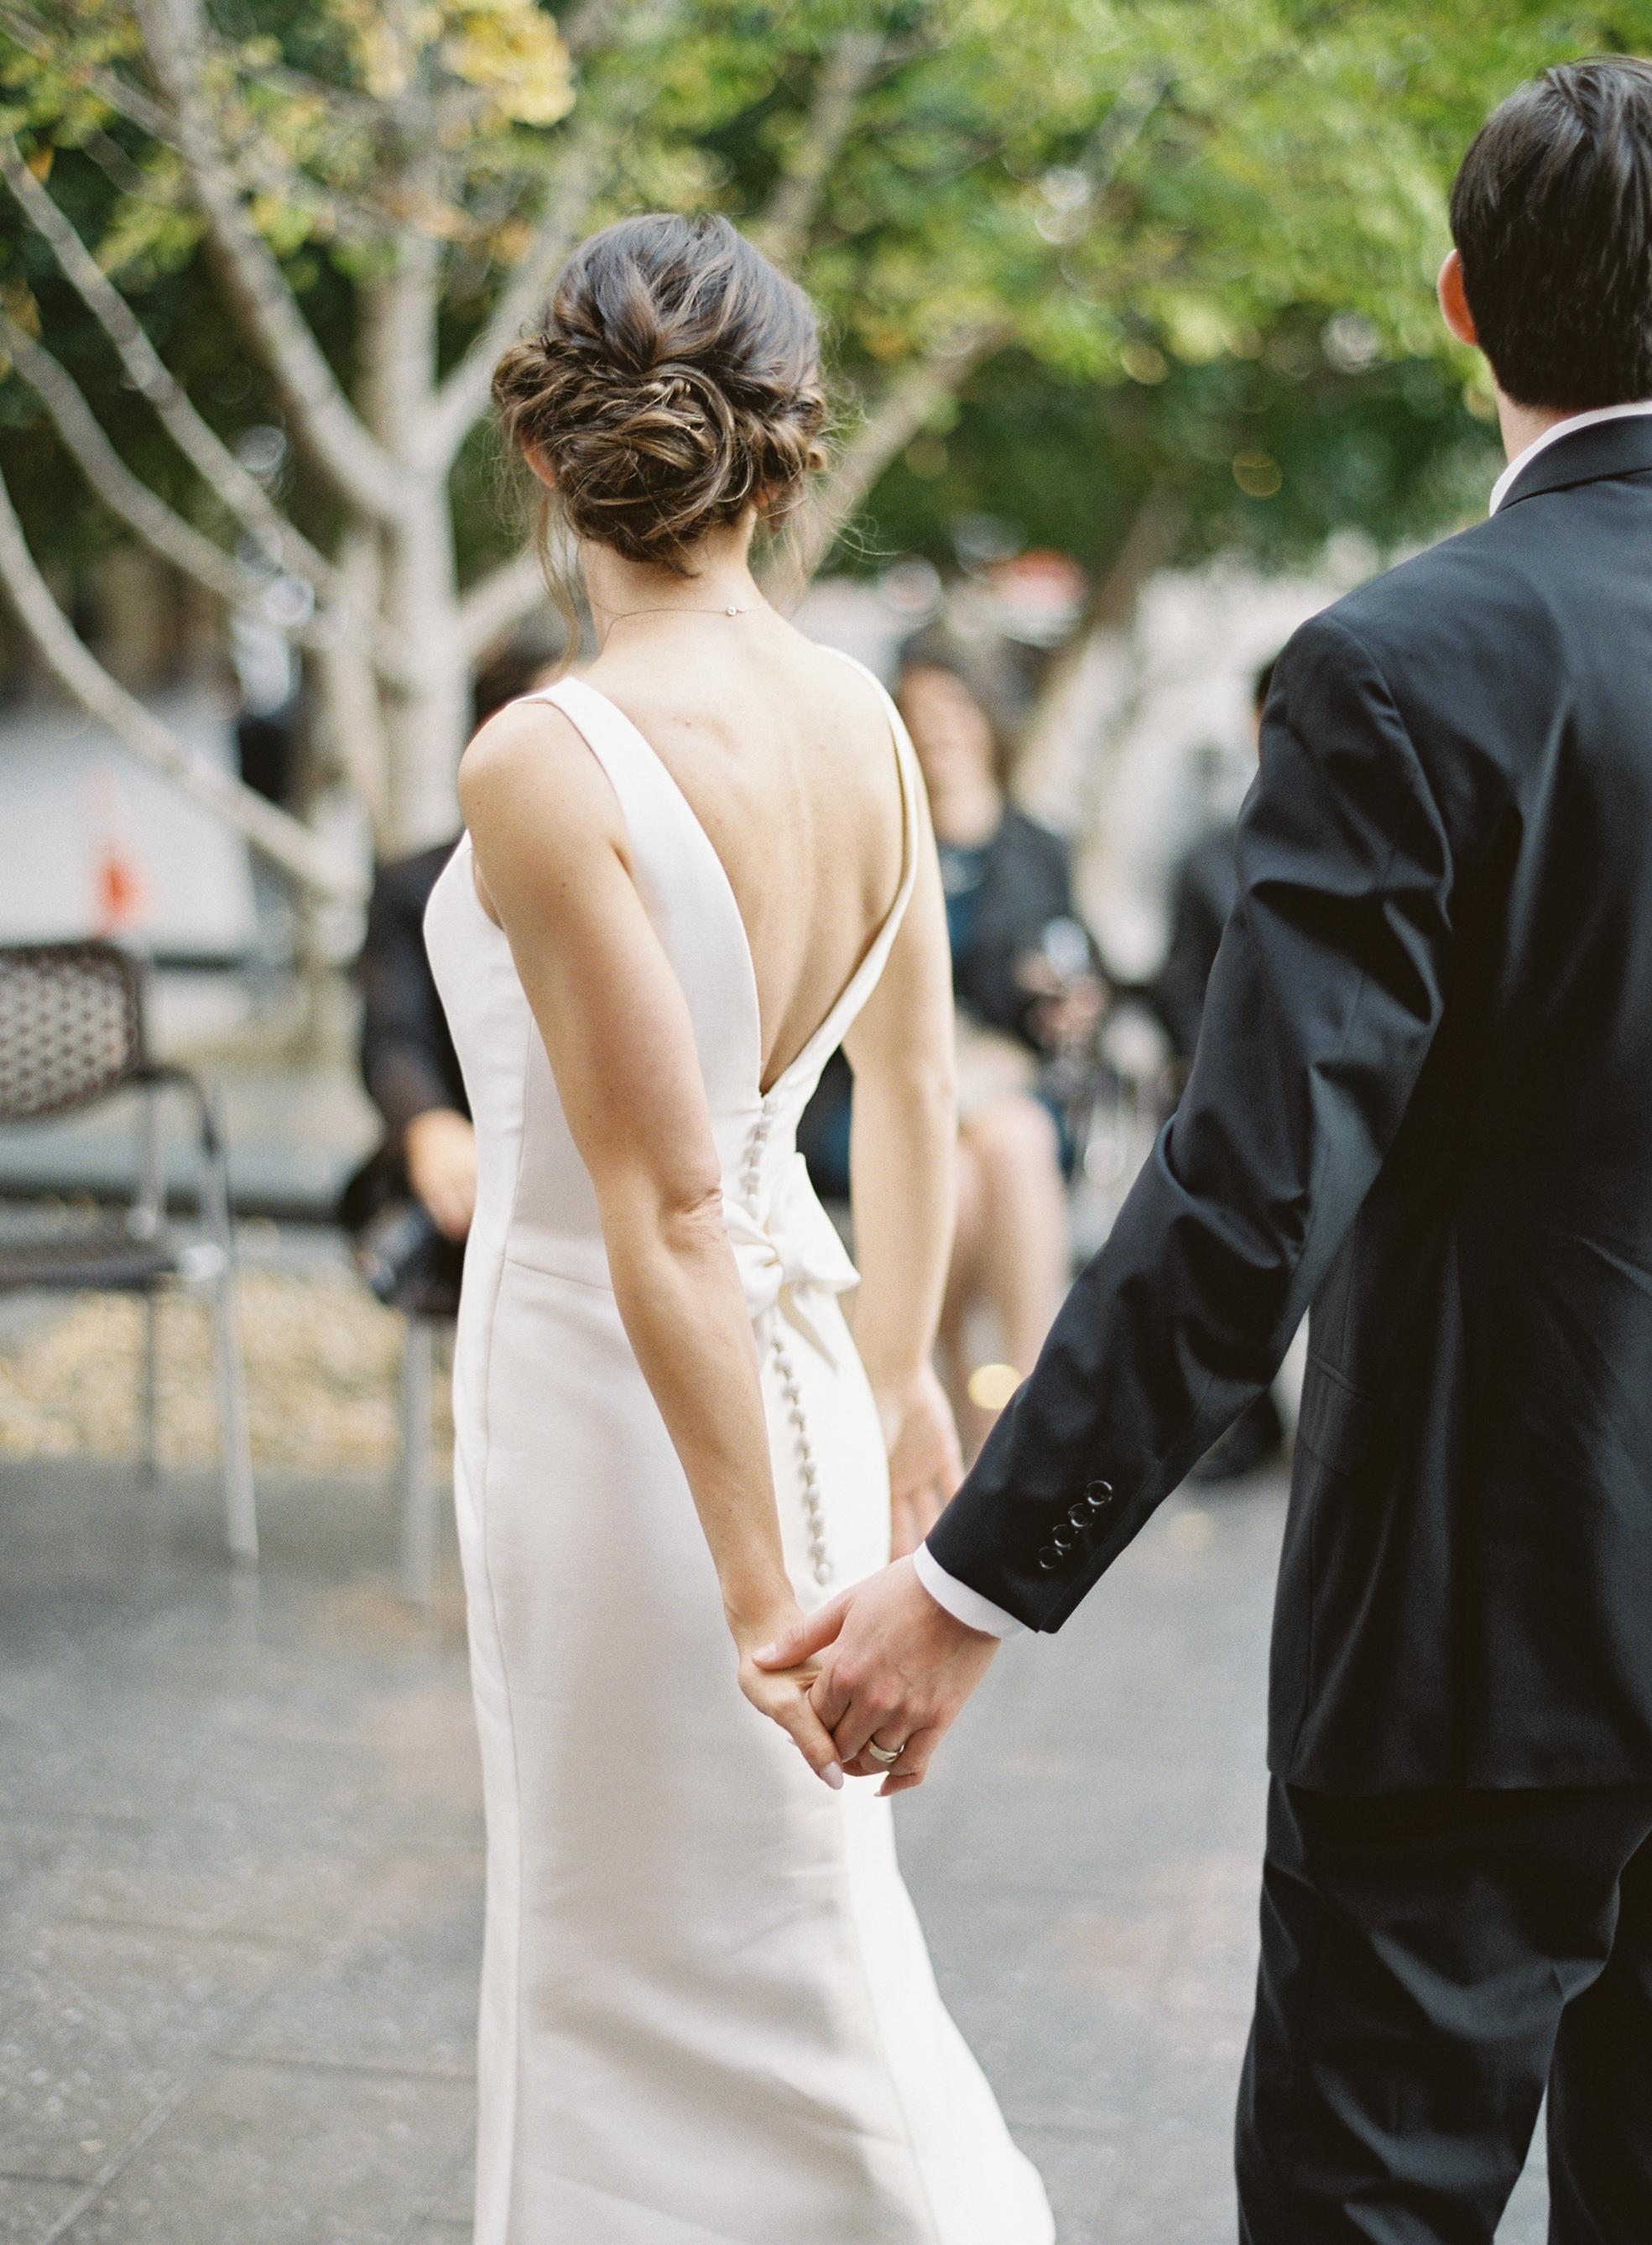 Meghan Mehan Photography - California Wedding Photographer | San Francisco City Hall Wedding 114.jpg